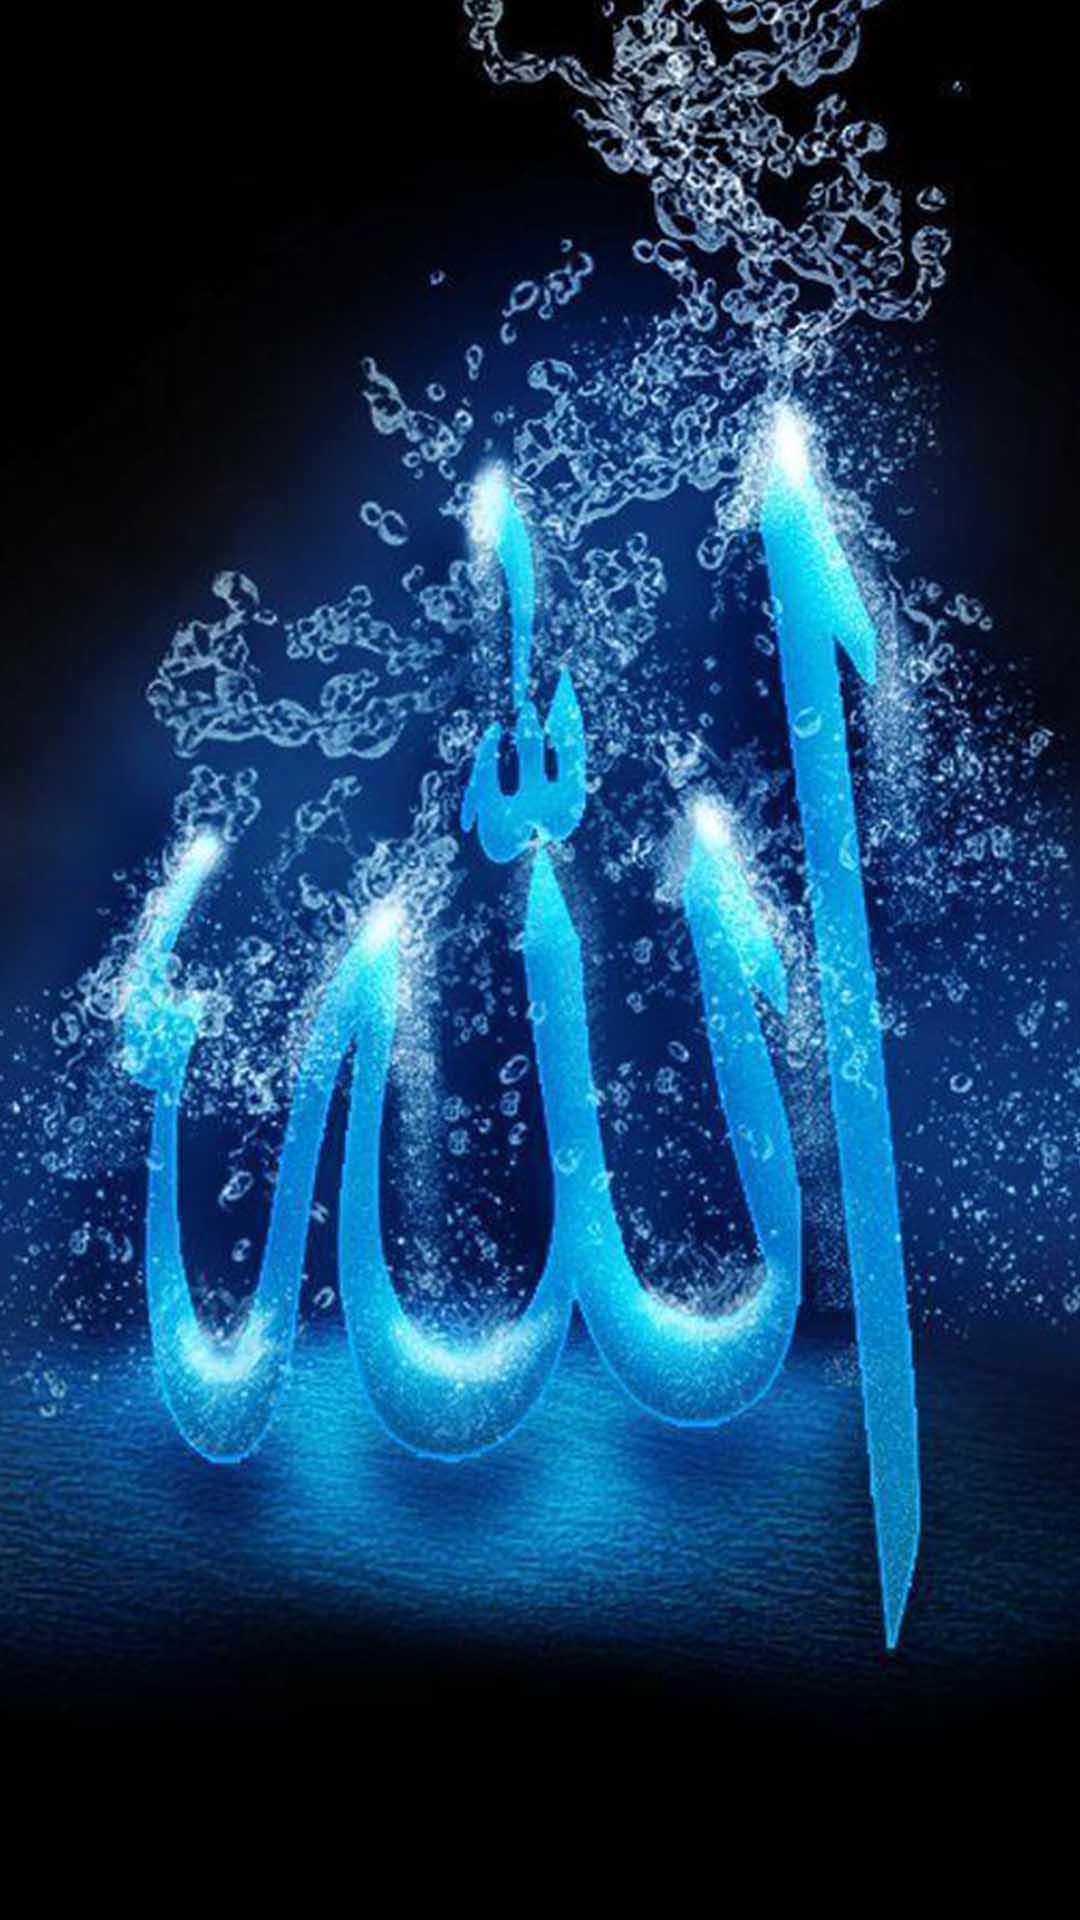 Islamic Wallpaper Allah Background Oneplus 7 8 Mi 9 - Islamic Allah - HD Wallpaper